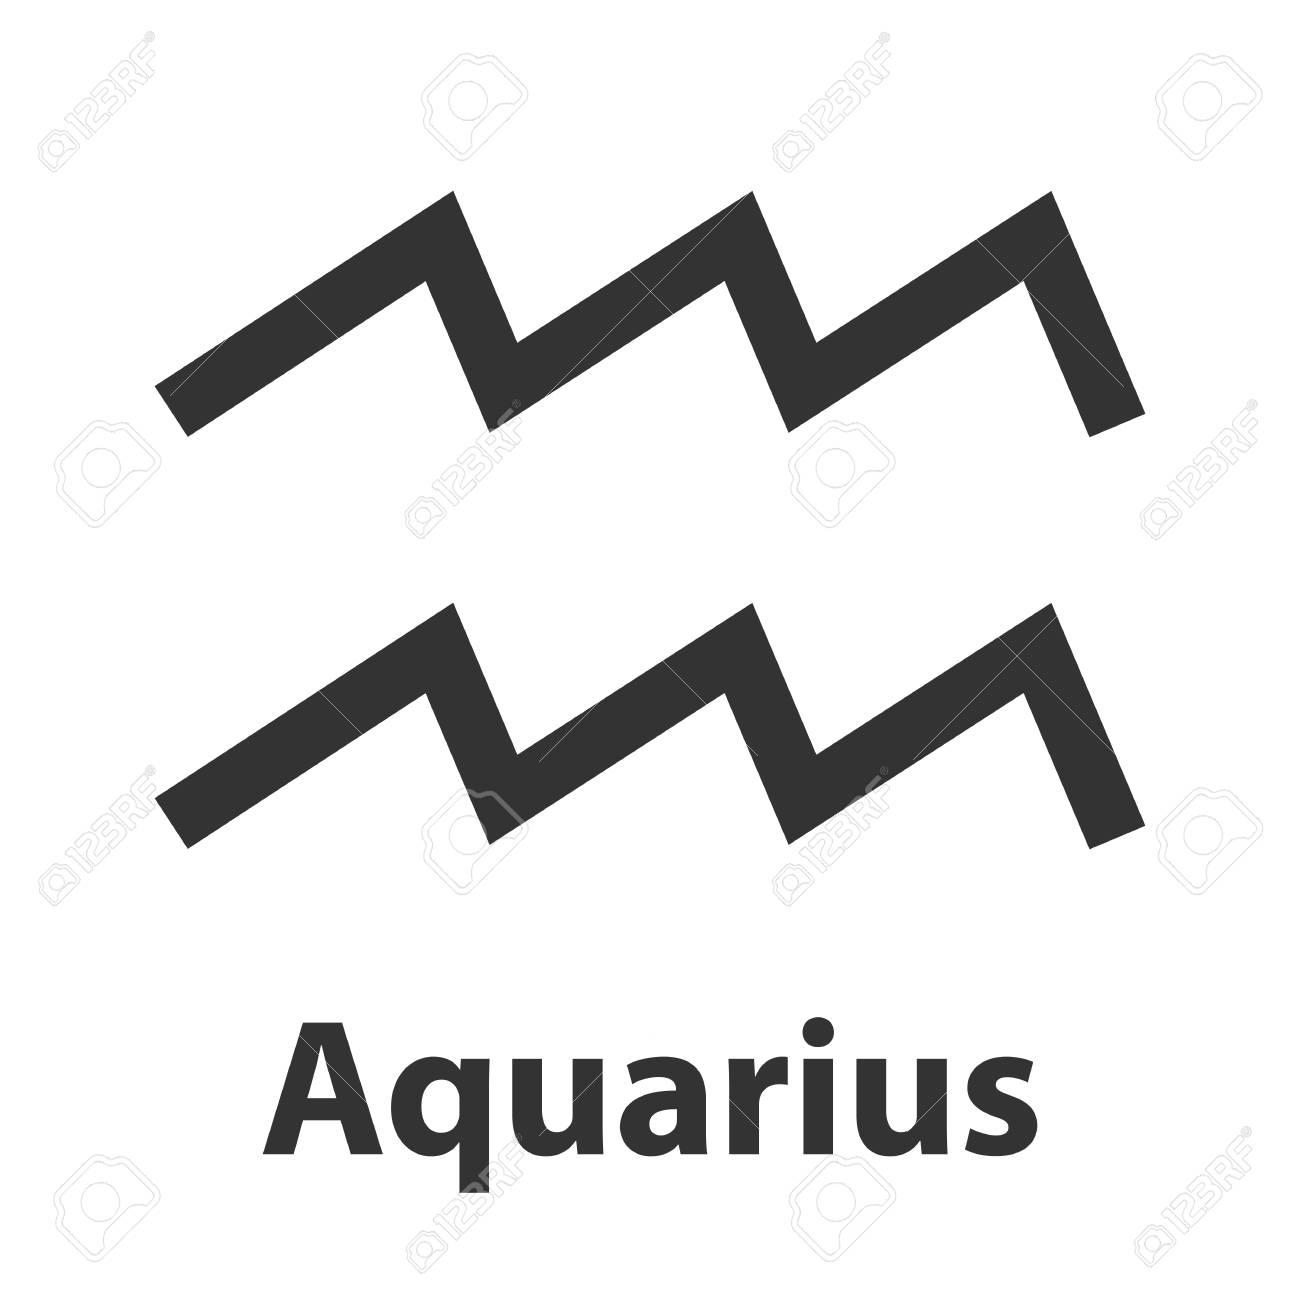 Aquarius waterbearer zodiac sign vector illustration icon aquarius waterbearer zodiac sign vector illustration icon stock vector 68283425 biocorpaavc Choice Image